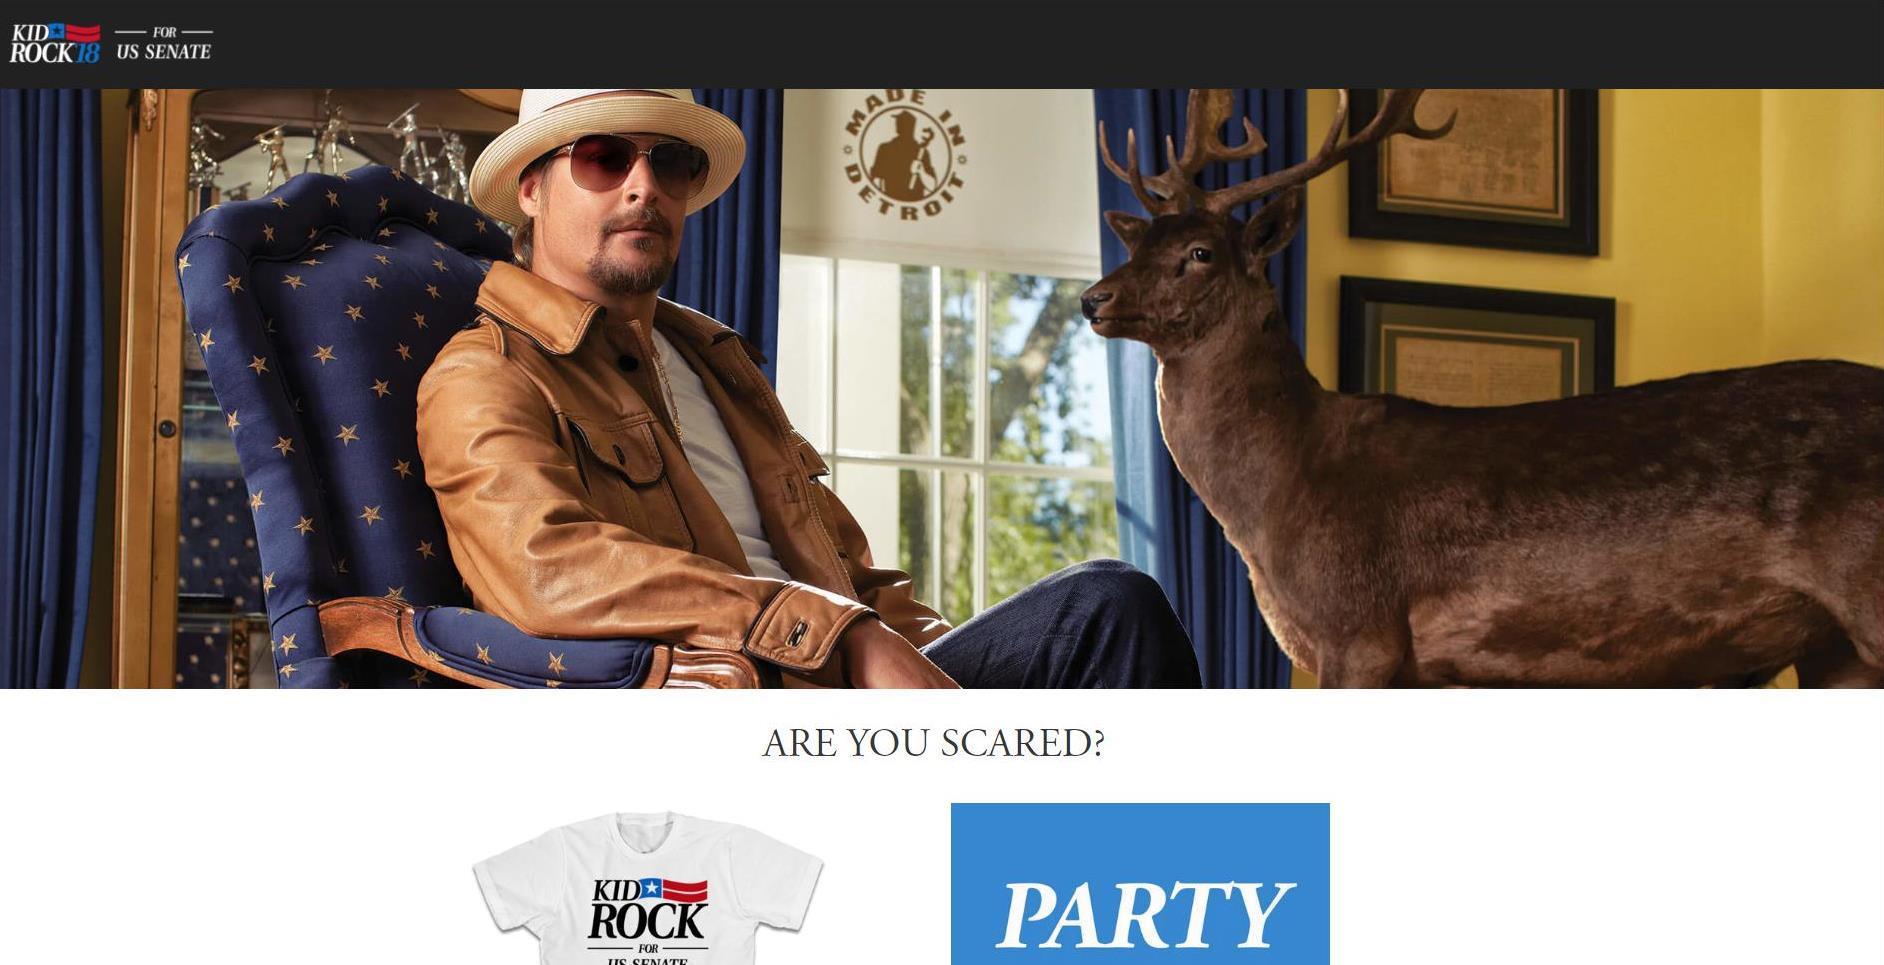 c6a28cf8d Kid Rock Donates Merchandise Money To Voter Registration | WKAR